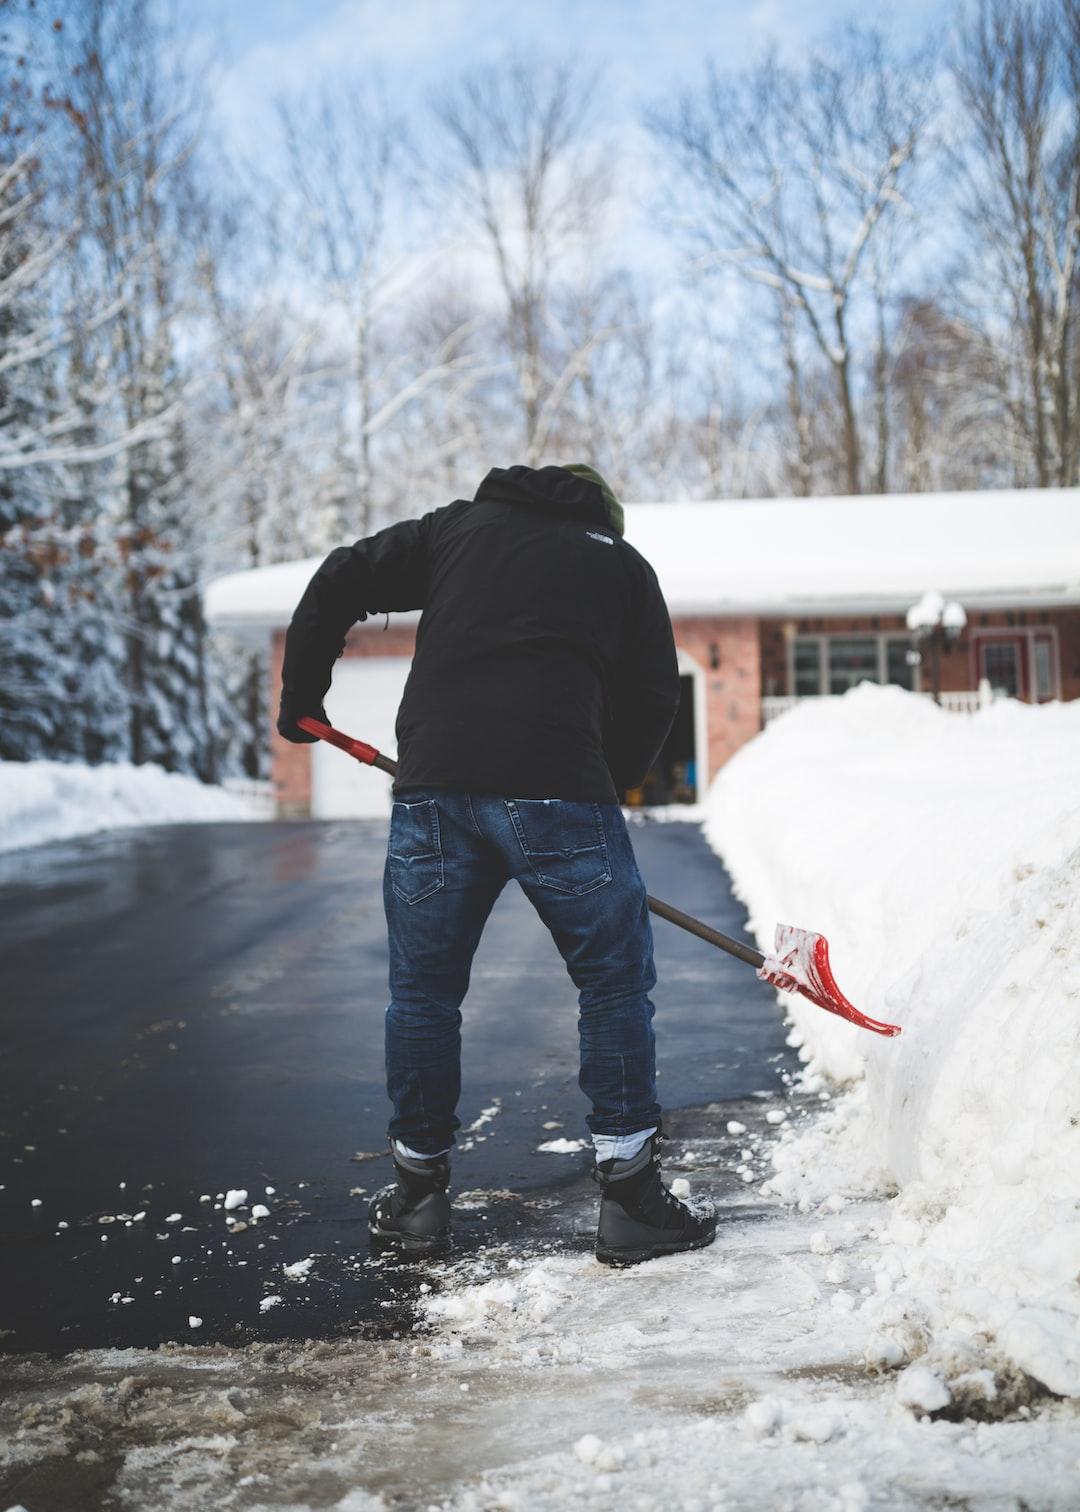 A man shoveling snow off his driveway in Muskoka